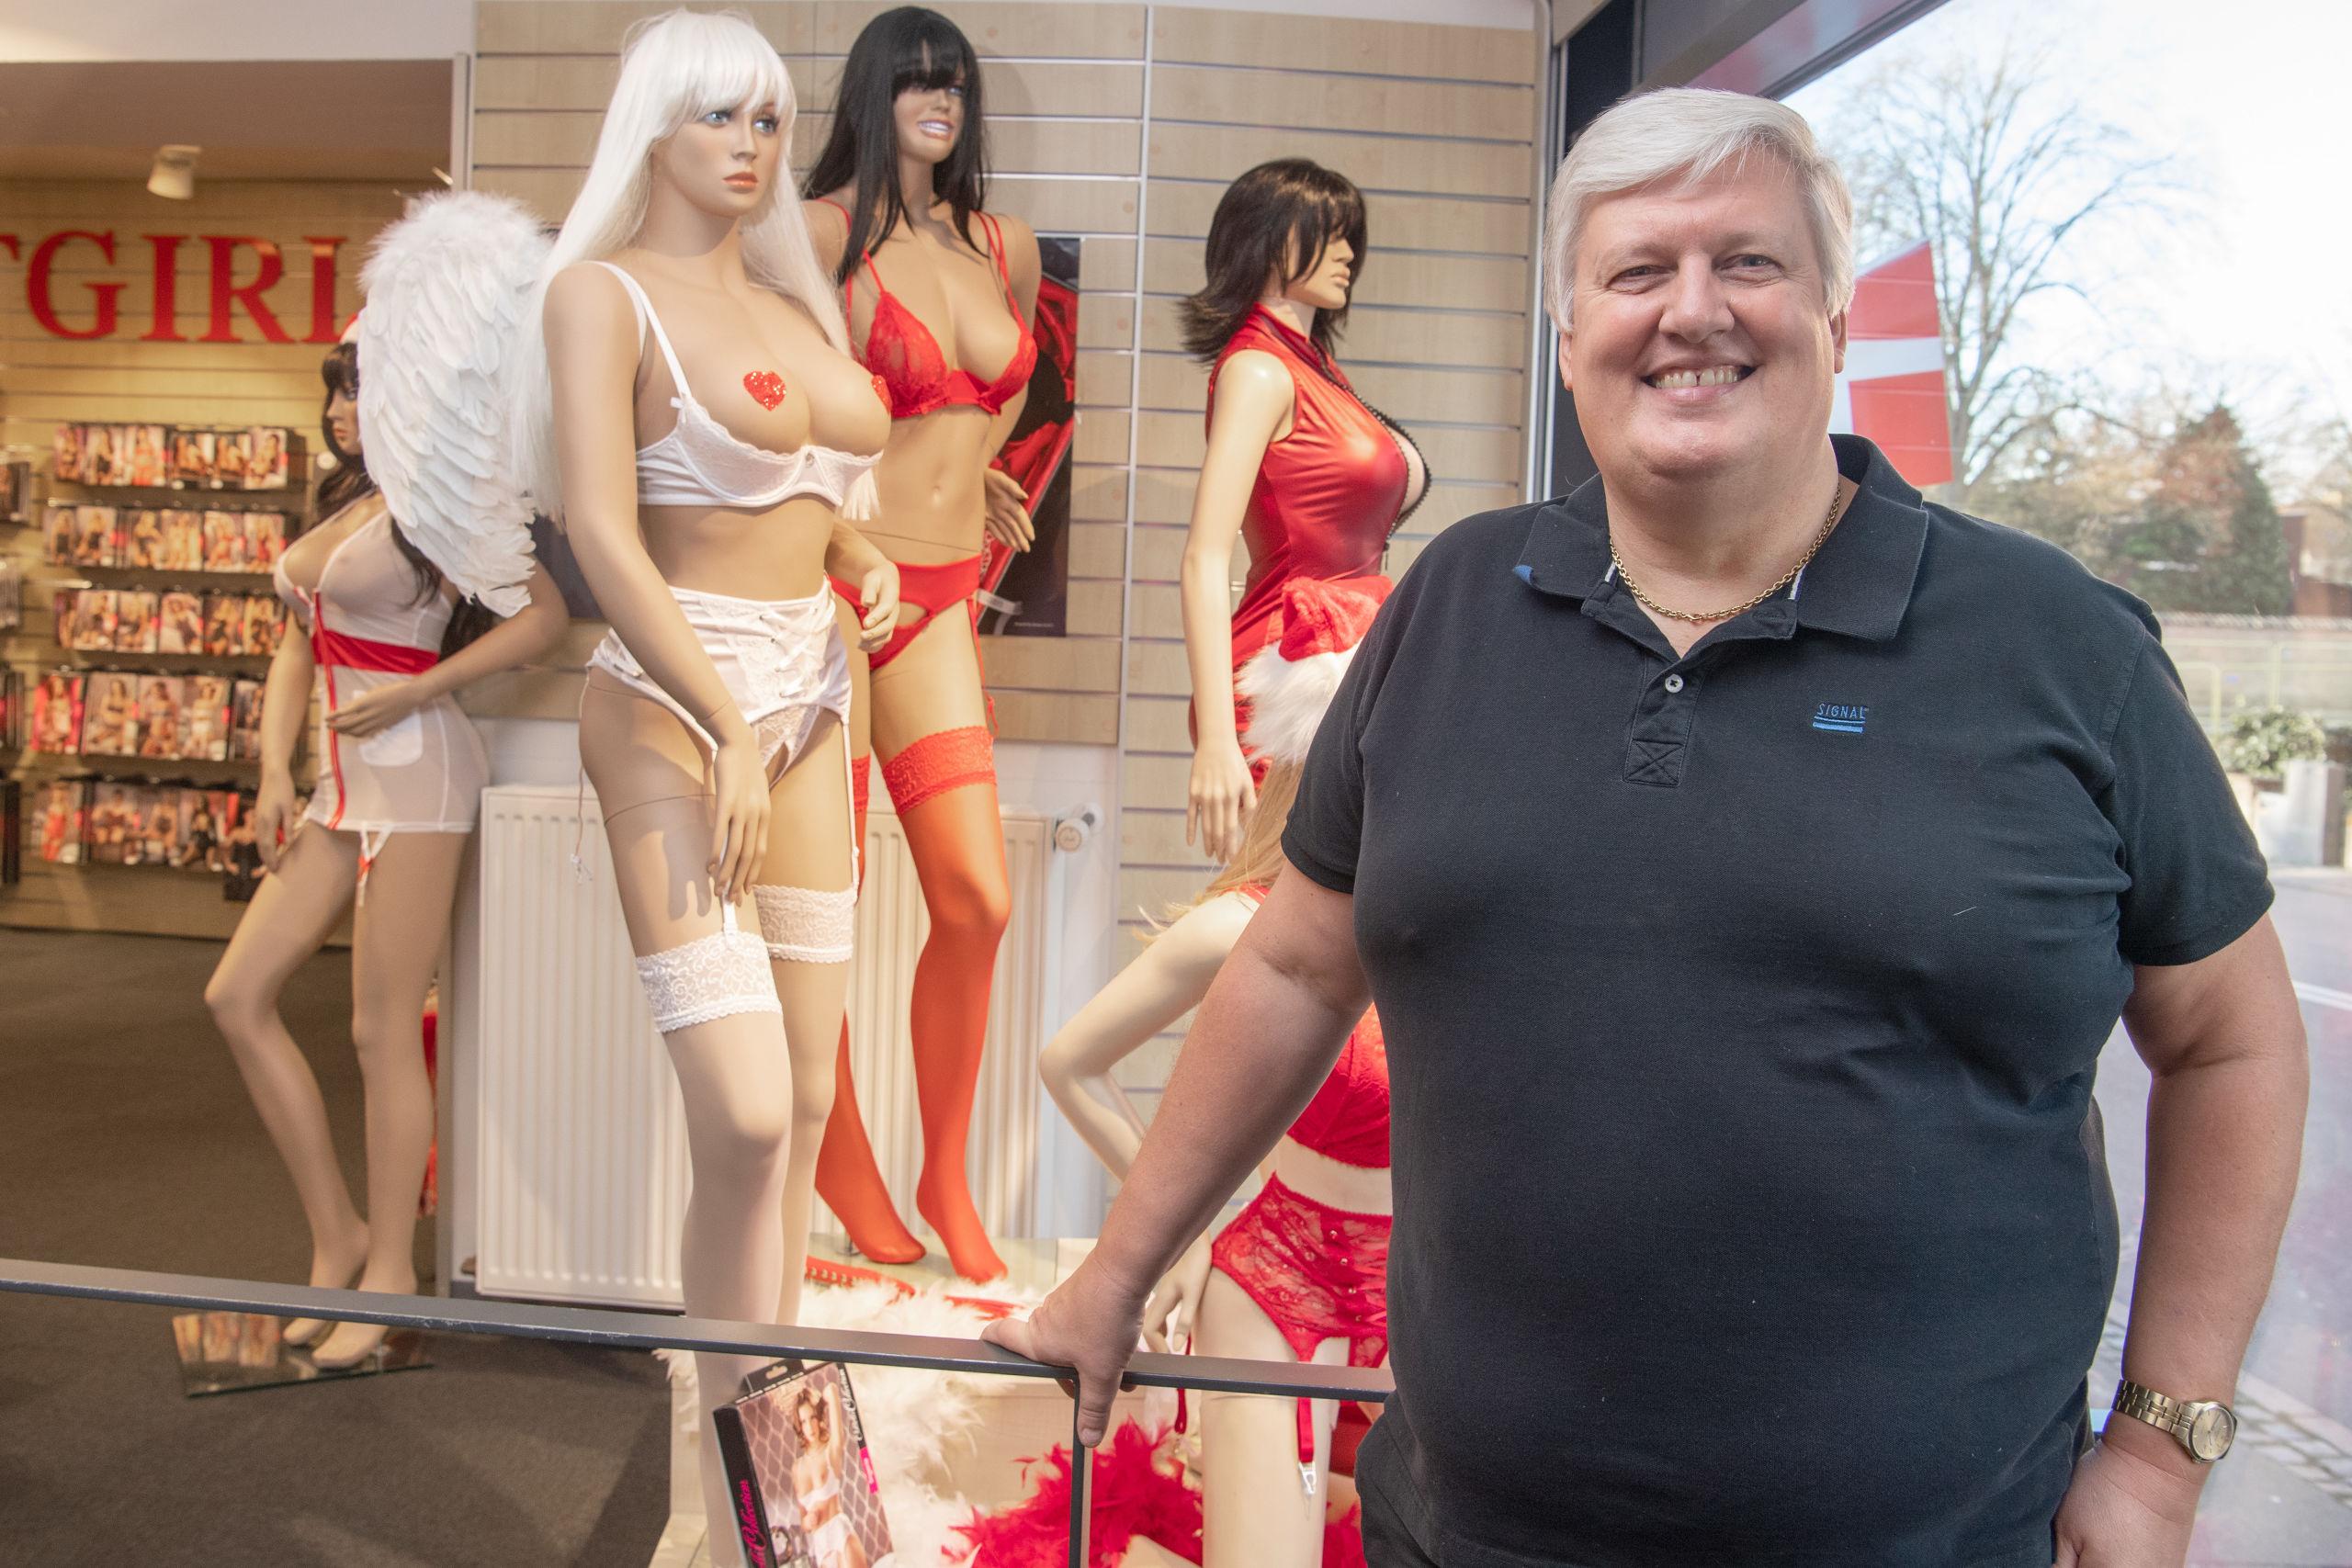 "Den 54-årige Kim Jensen ejer ""Hotgirl"", og han har desuden erotiske butikker i henholdsvis Aarhus og Kolding. Foto: Henrik Louis"